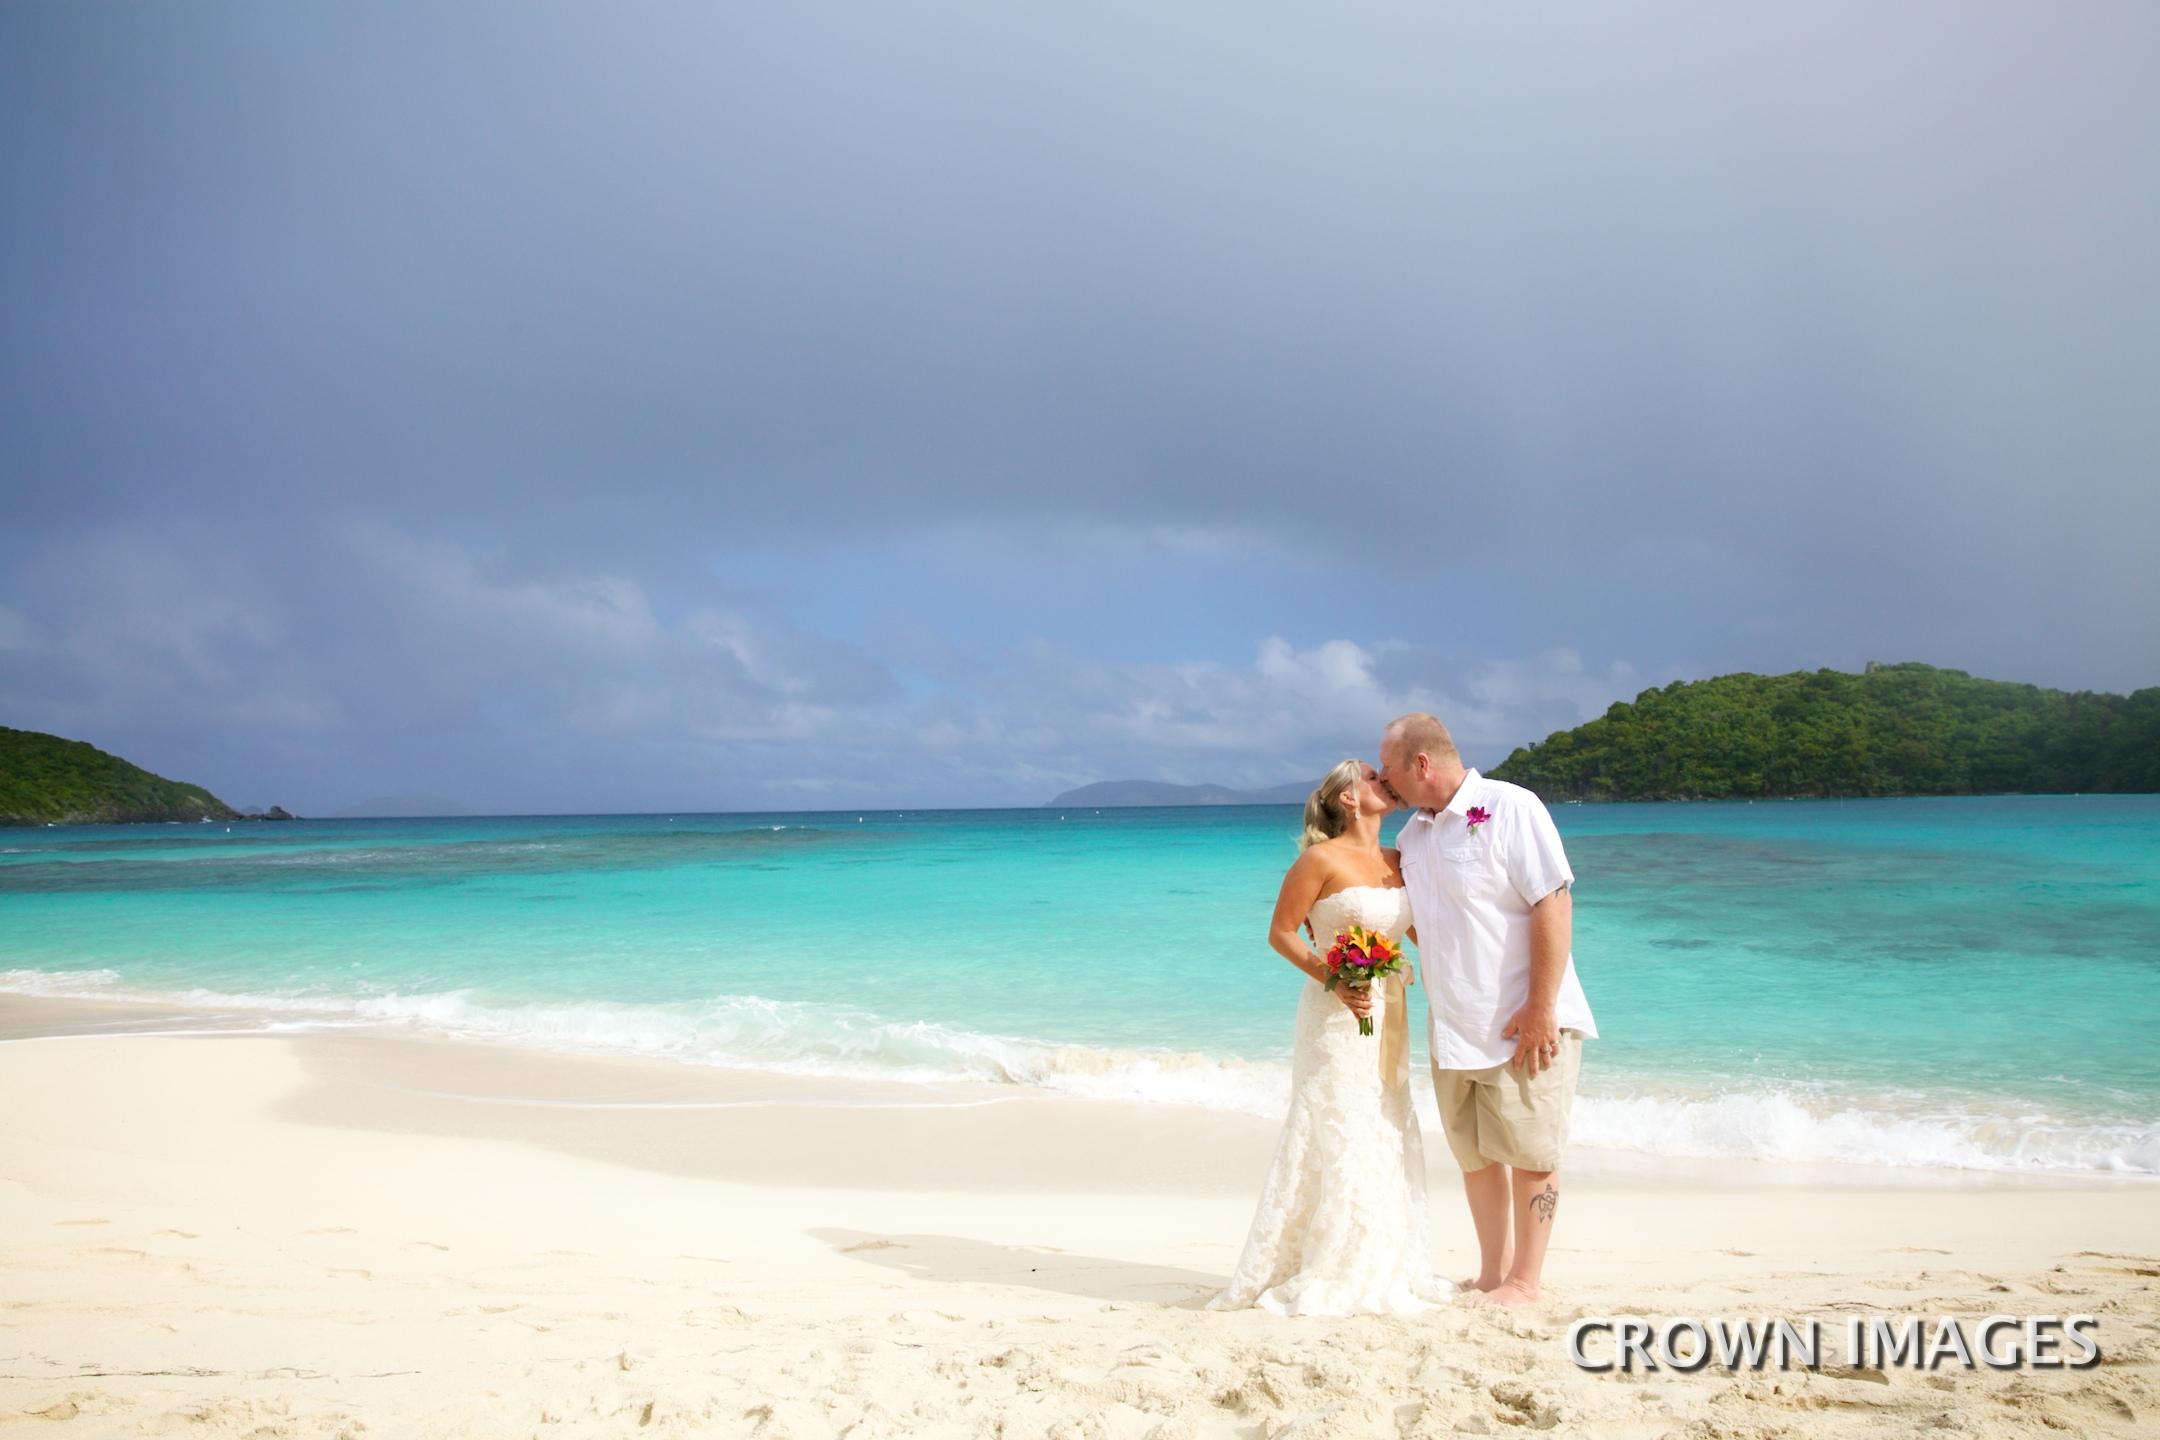 crown images photography virgin islands IMG_6299.jpg